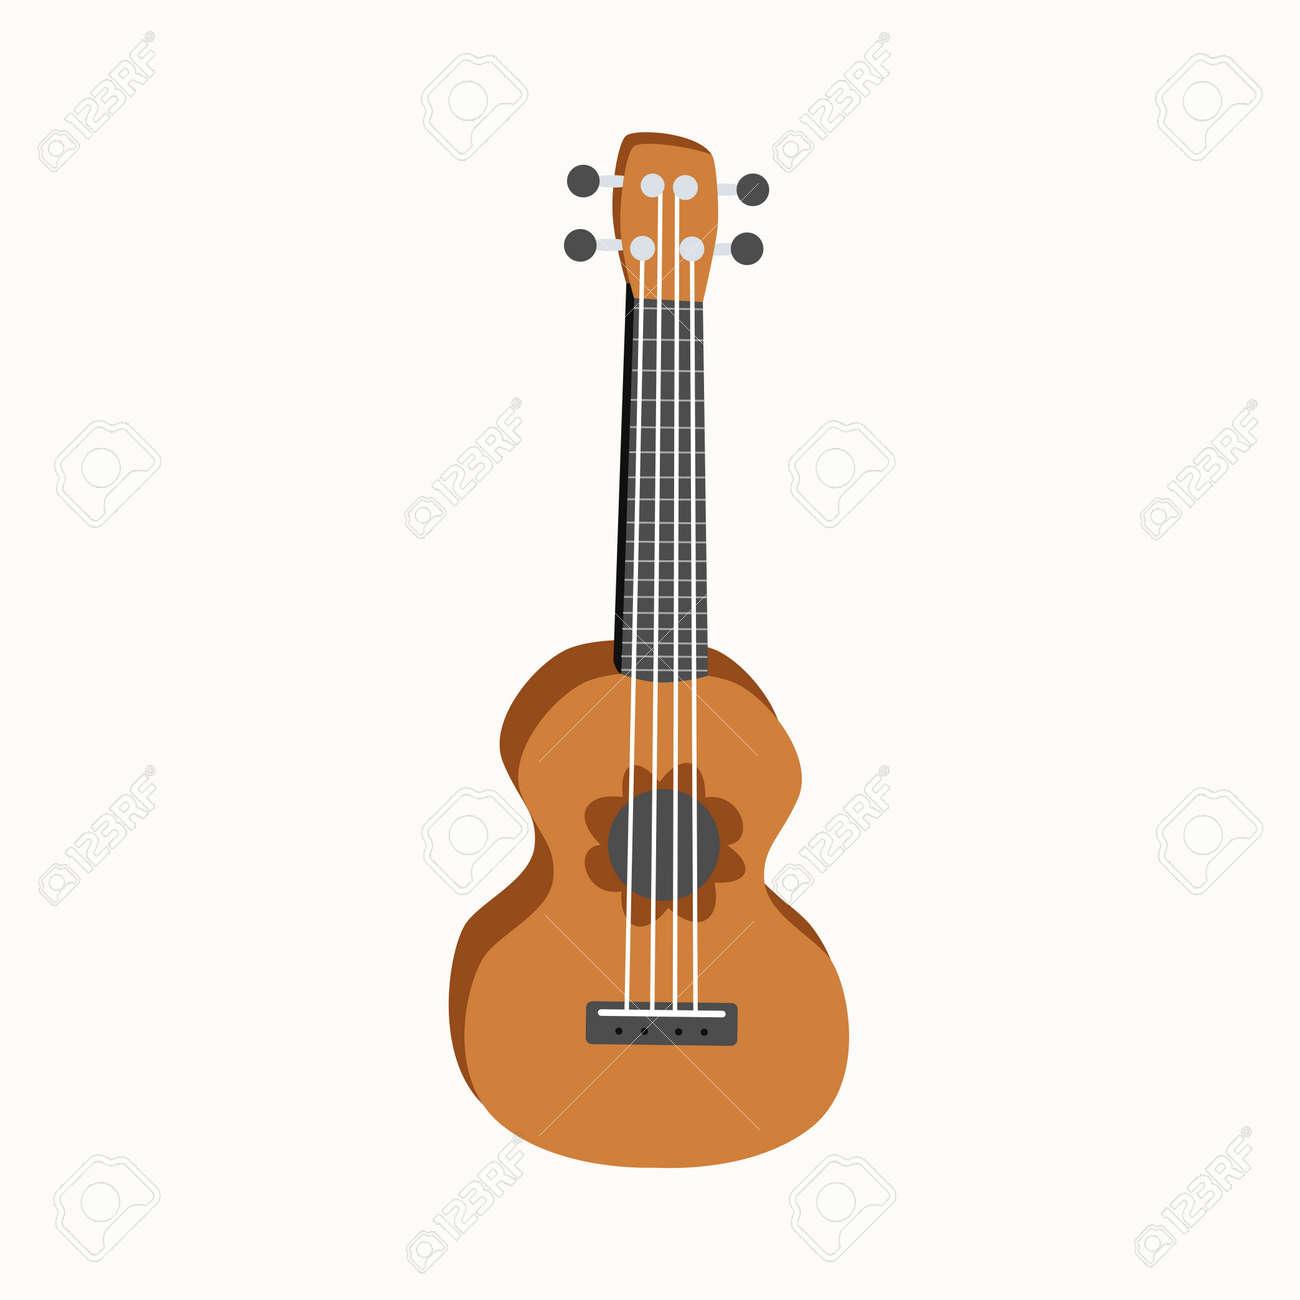 Ukulele flat design, four-string guitar illustration on background - 154166232